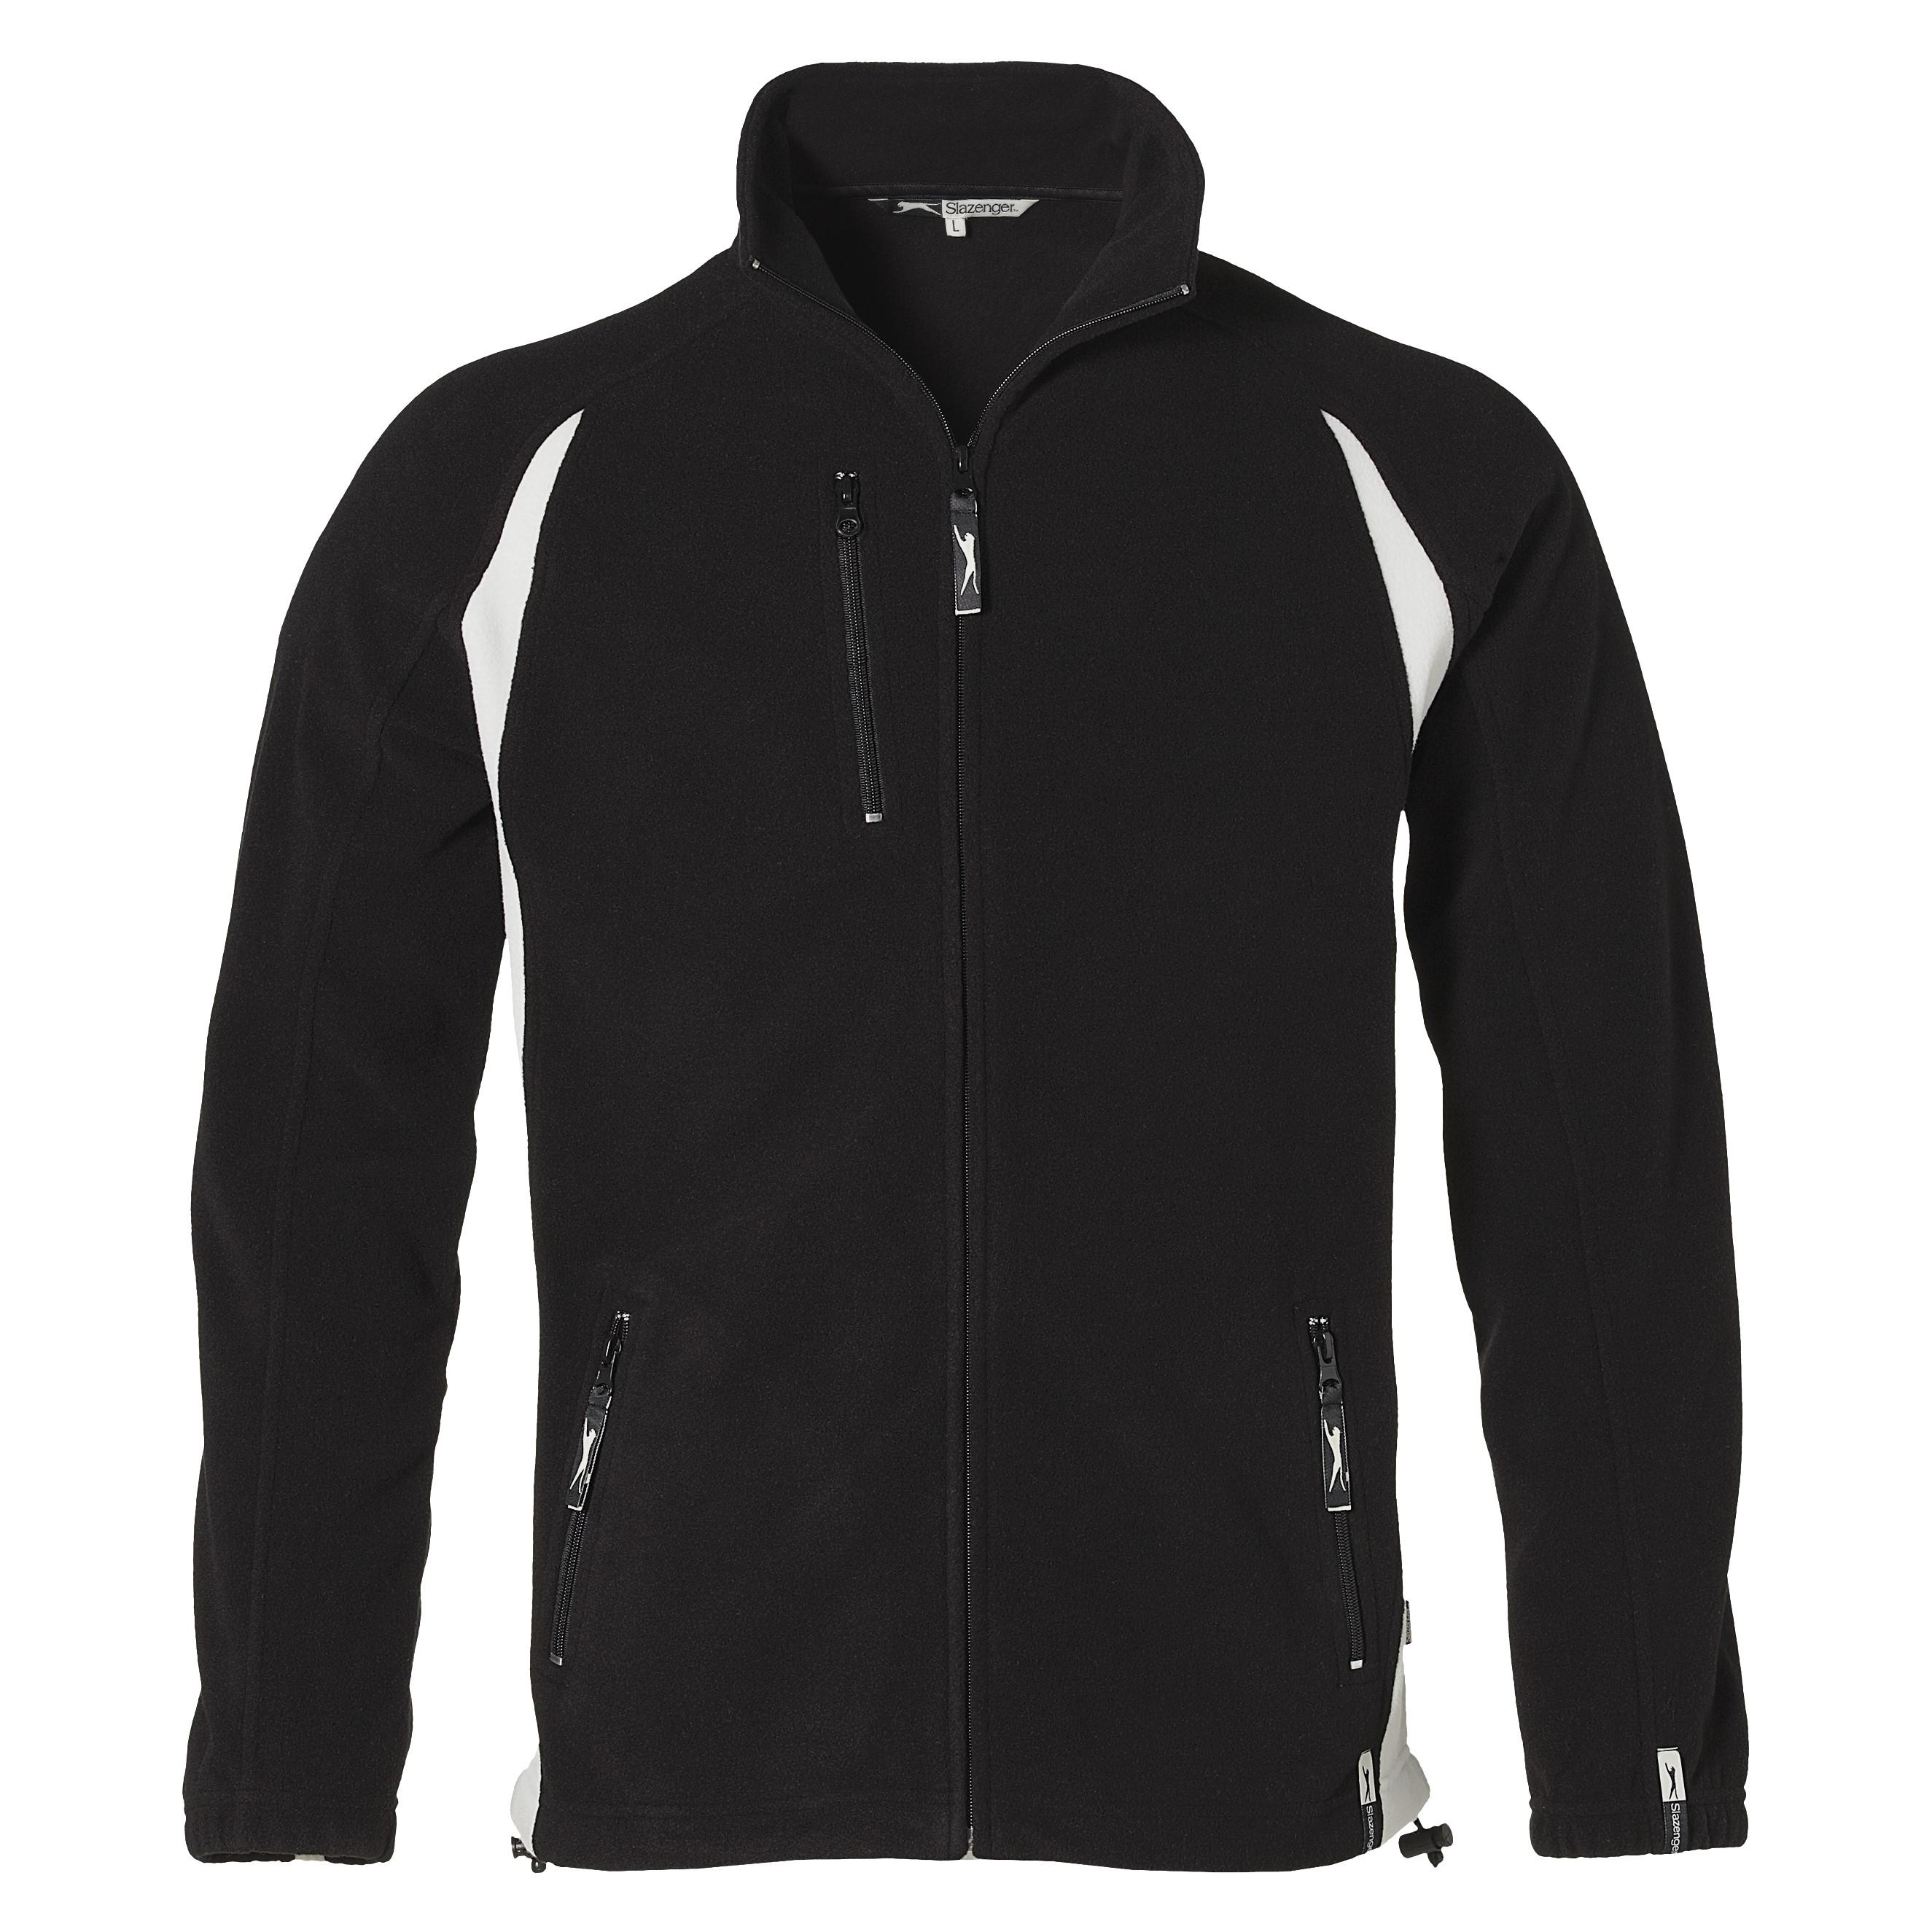 Mens Apex Micro Fleece Jacket - Black Only